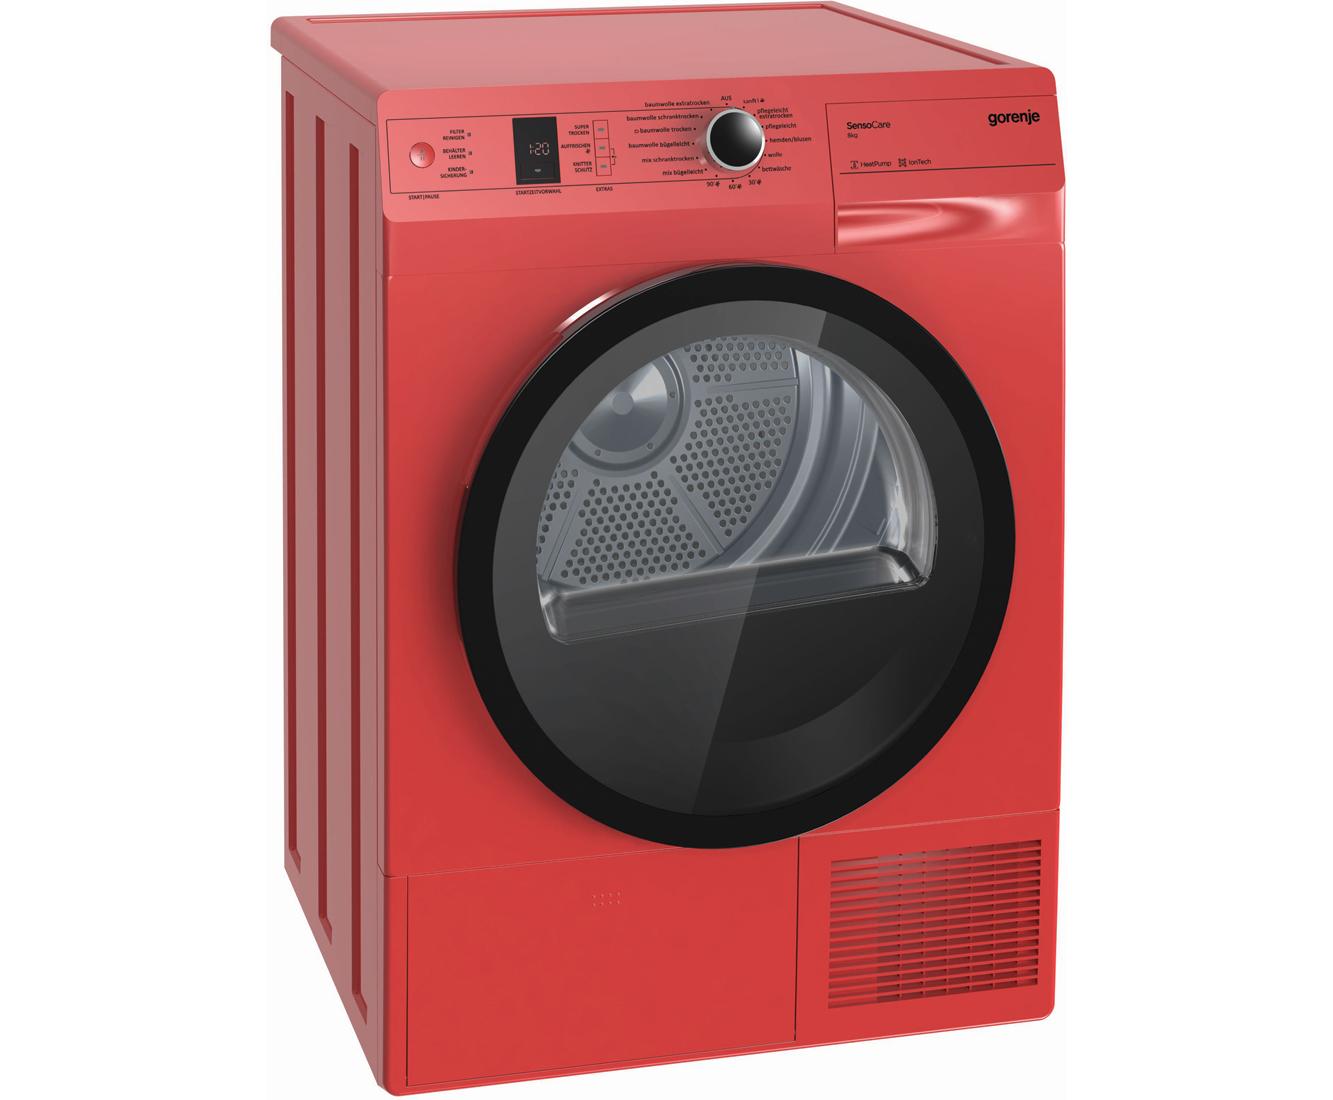 Gorenje Kühlschrank Filter Blinkt : Gorenje trockner filter reinigen li❶il trockner reparatur